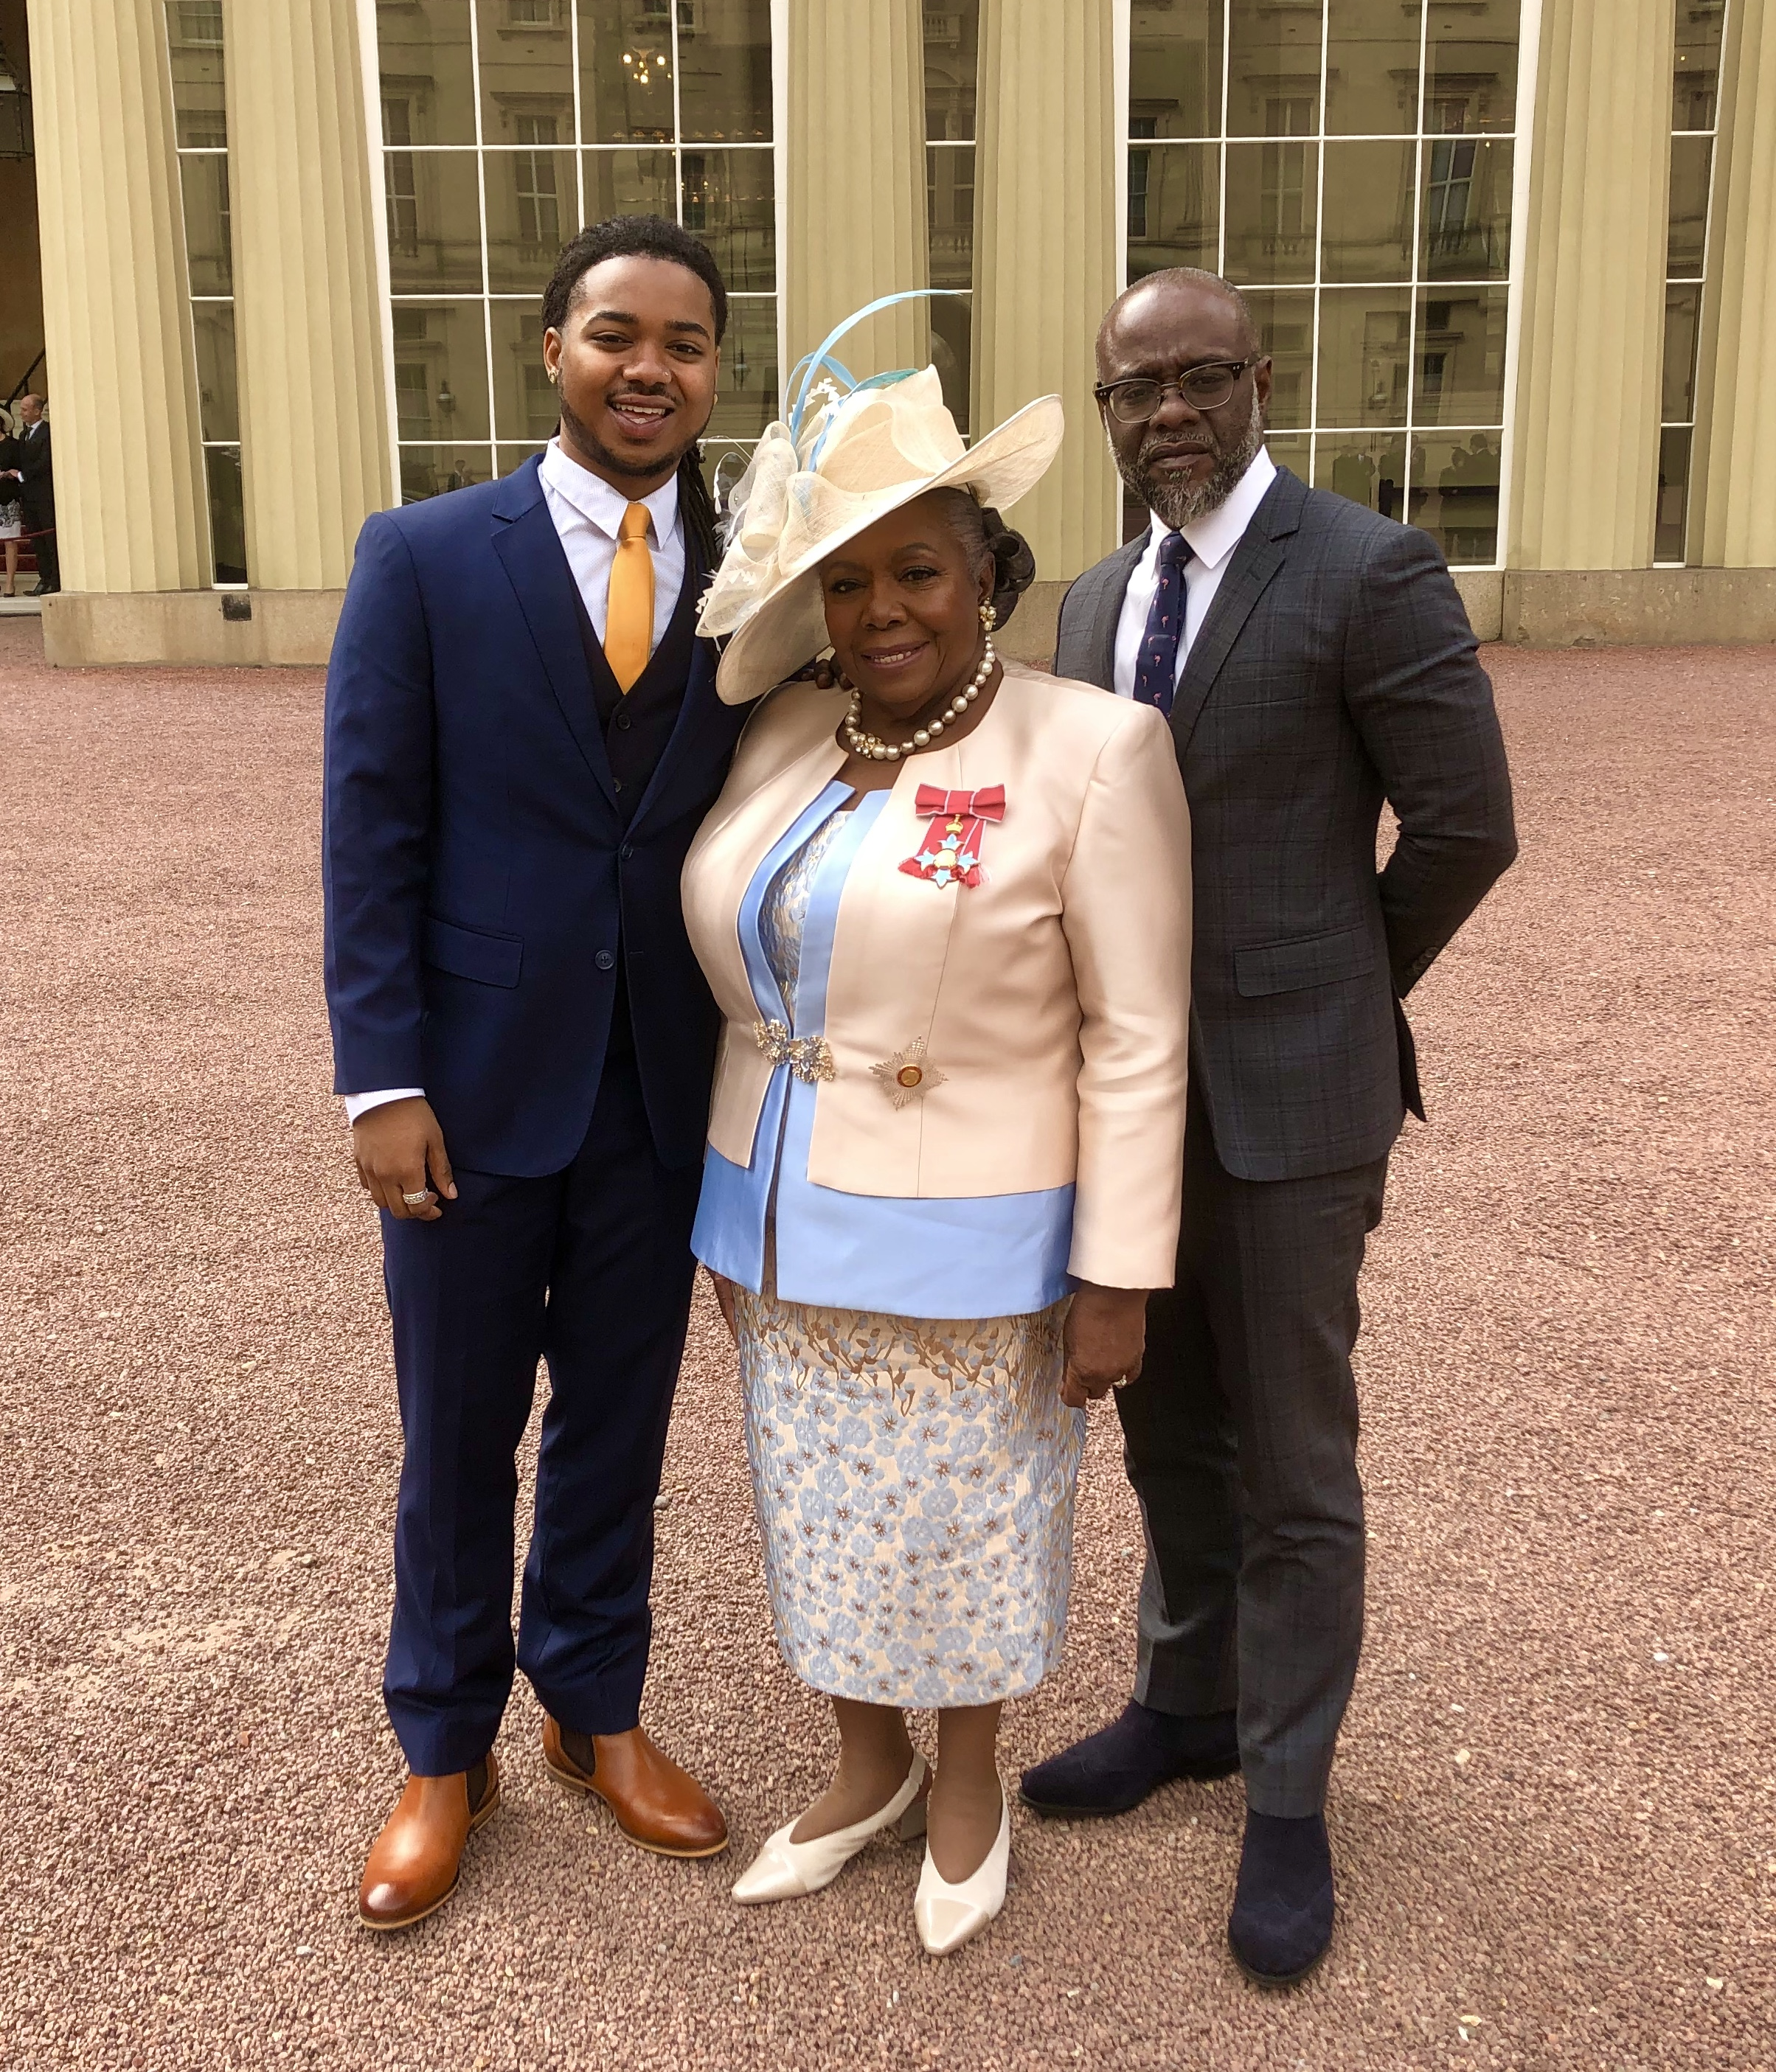 Bostwick named Dame at Buckingham Palace